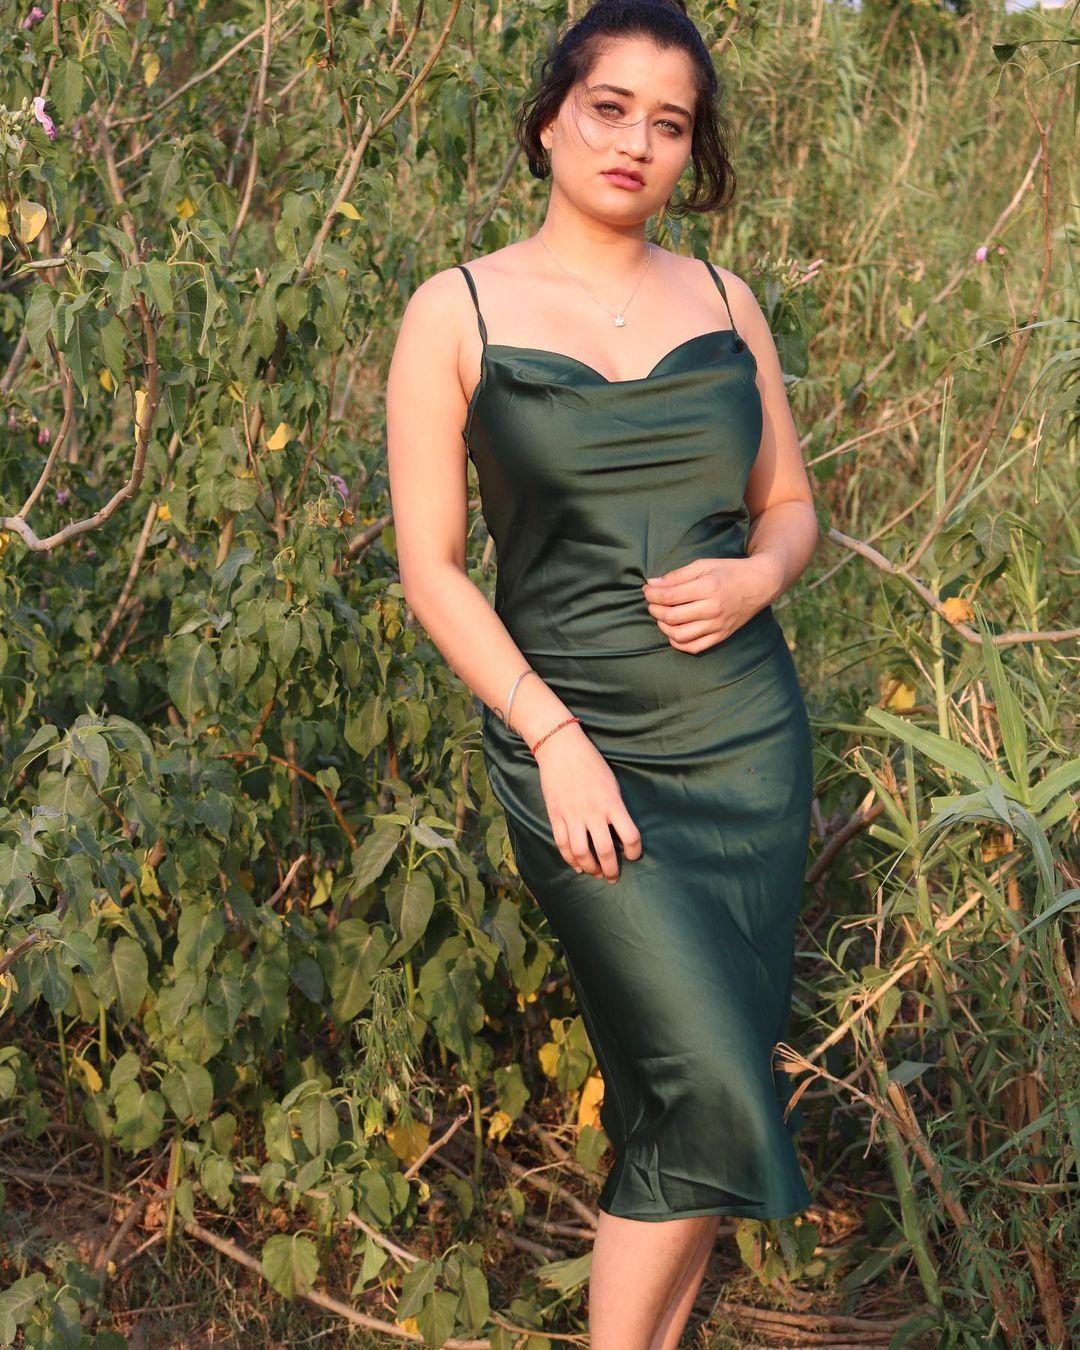 Shweta Sharma Influencer Photos Images Wallpapers